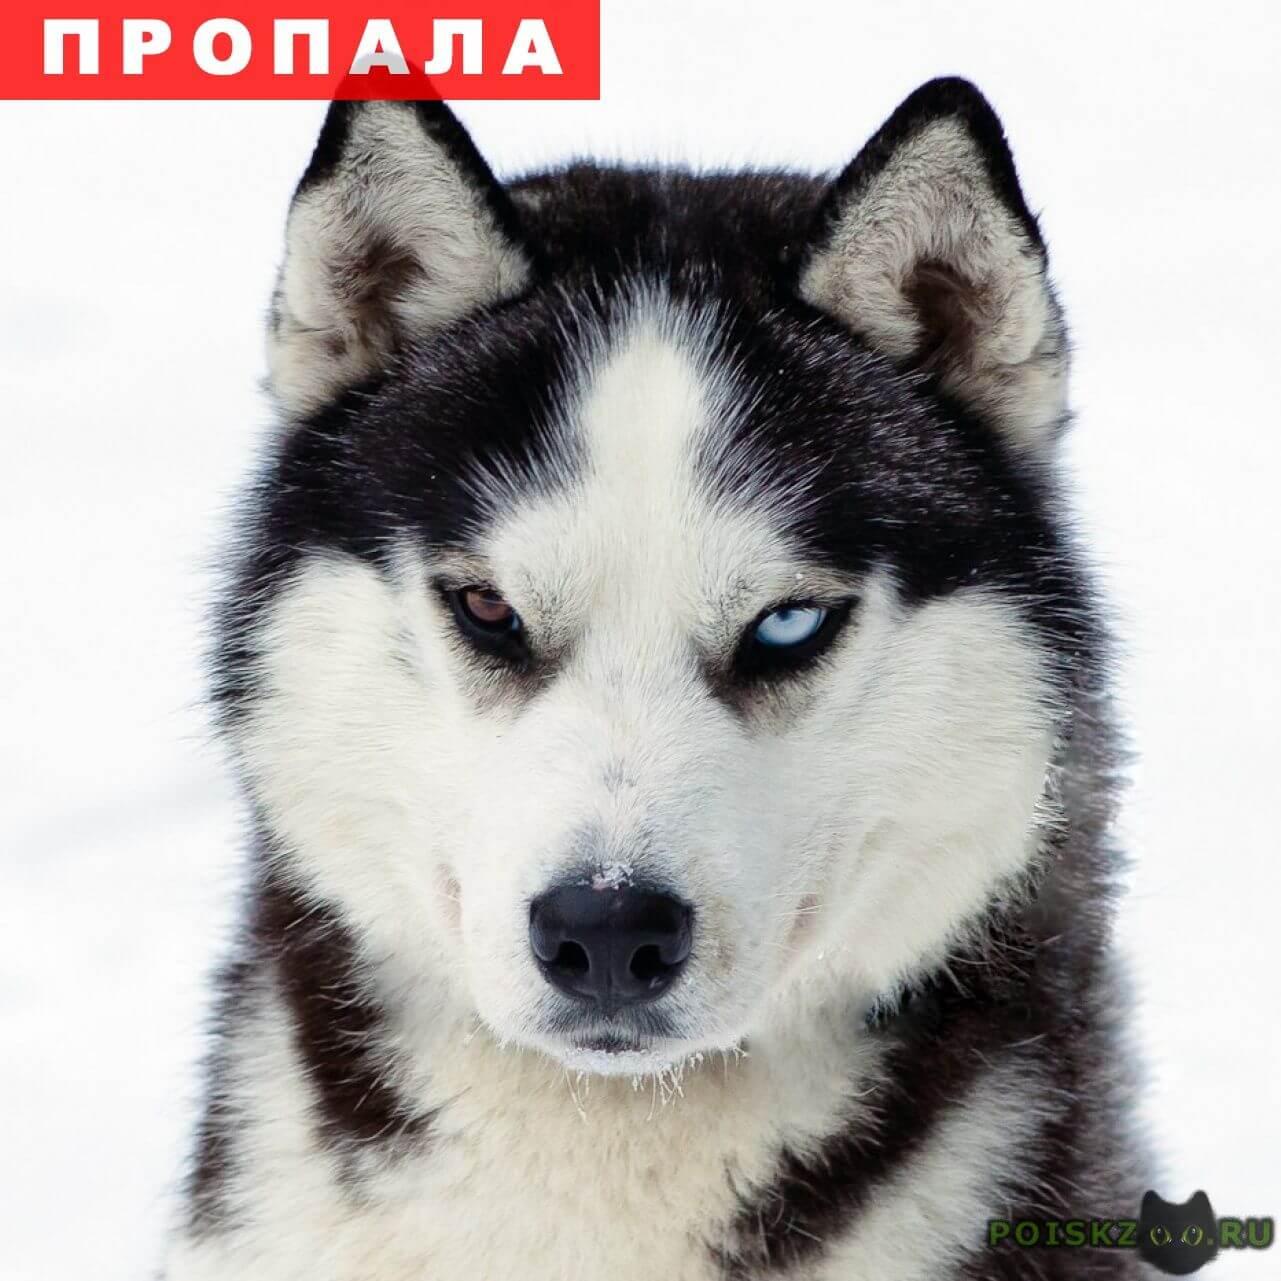 Пропала собака кобель мальчик арчи, порода хаски. г.Краснодар